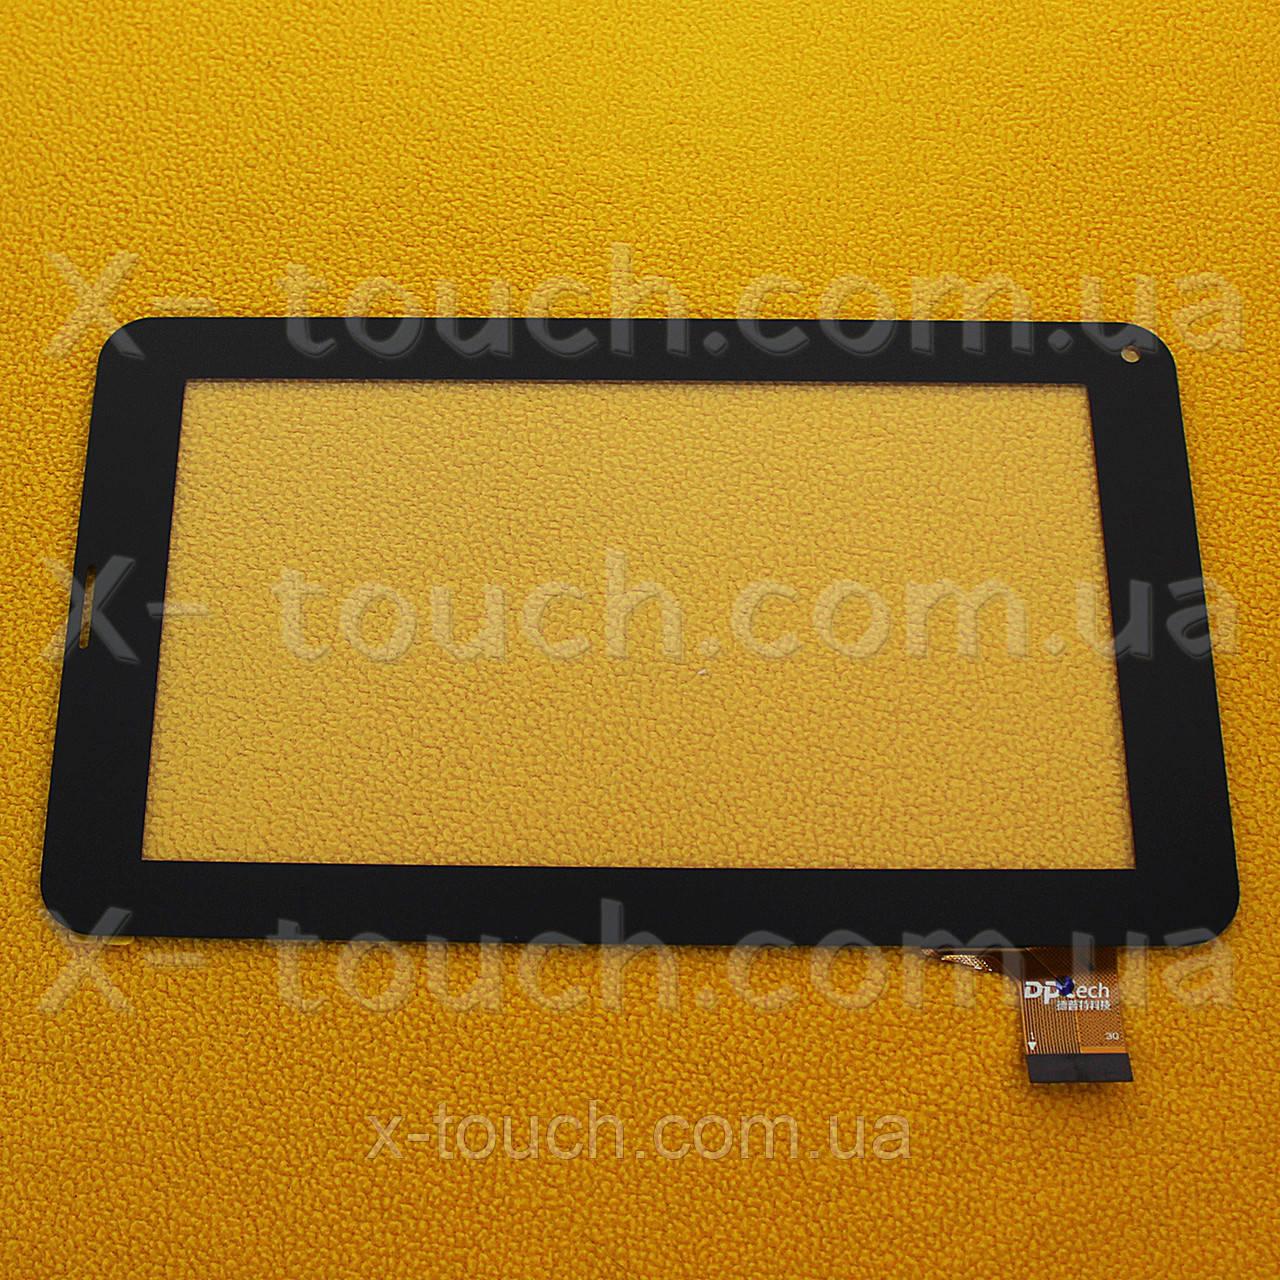 Тачскрин, сенсор  ry002b  для планшета